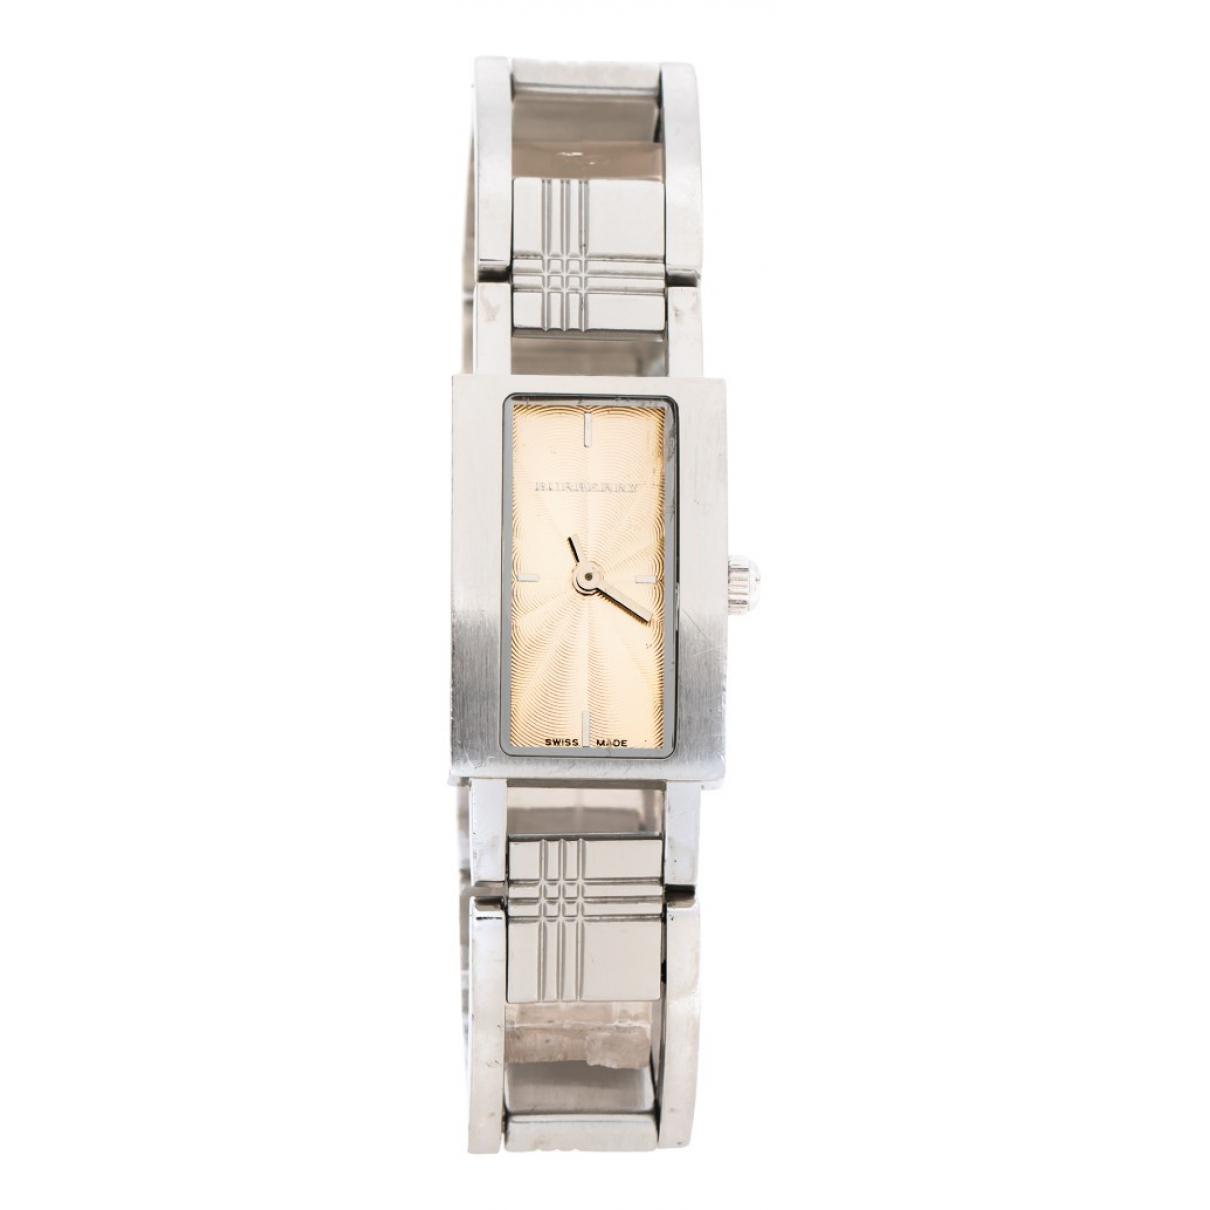 Burberry \N Uhr in  Beige Stahl